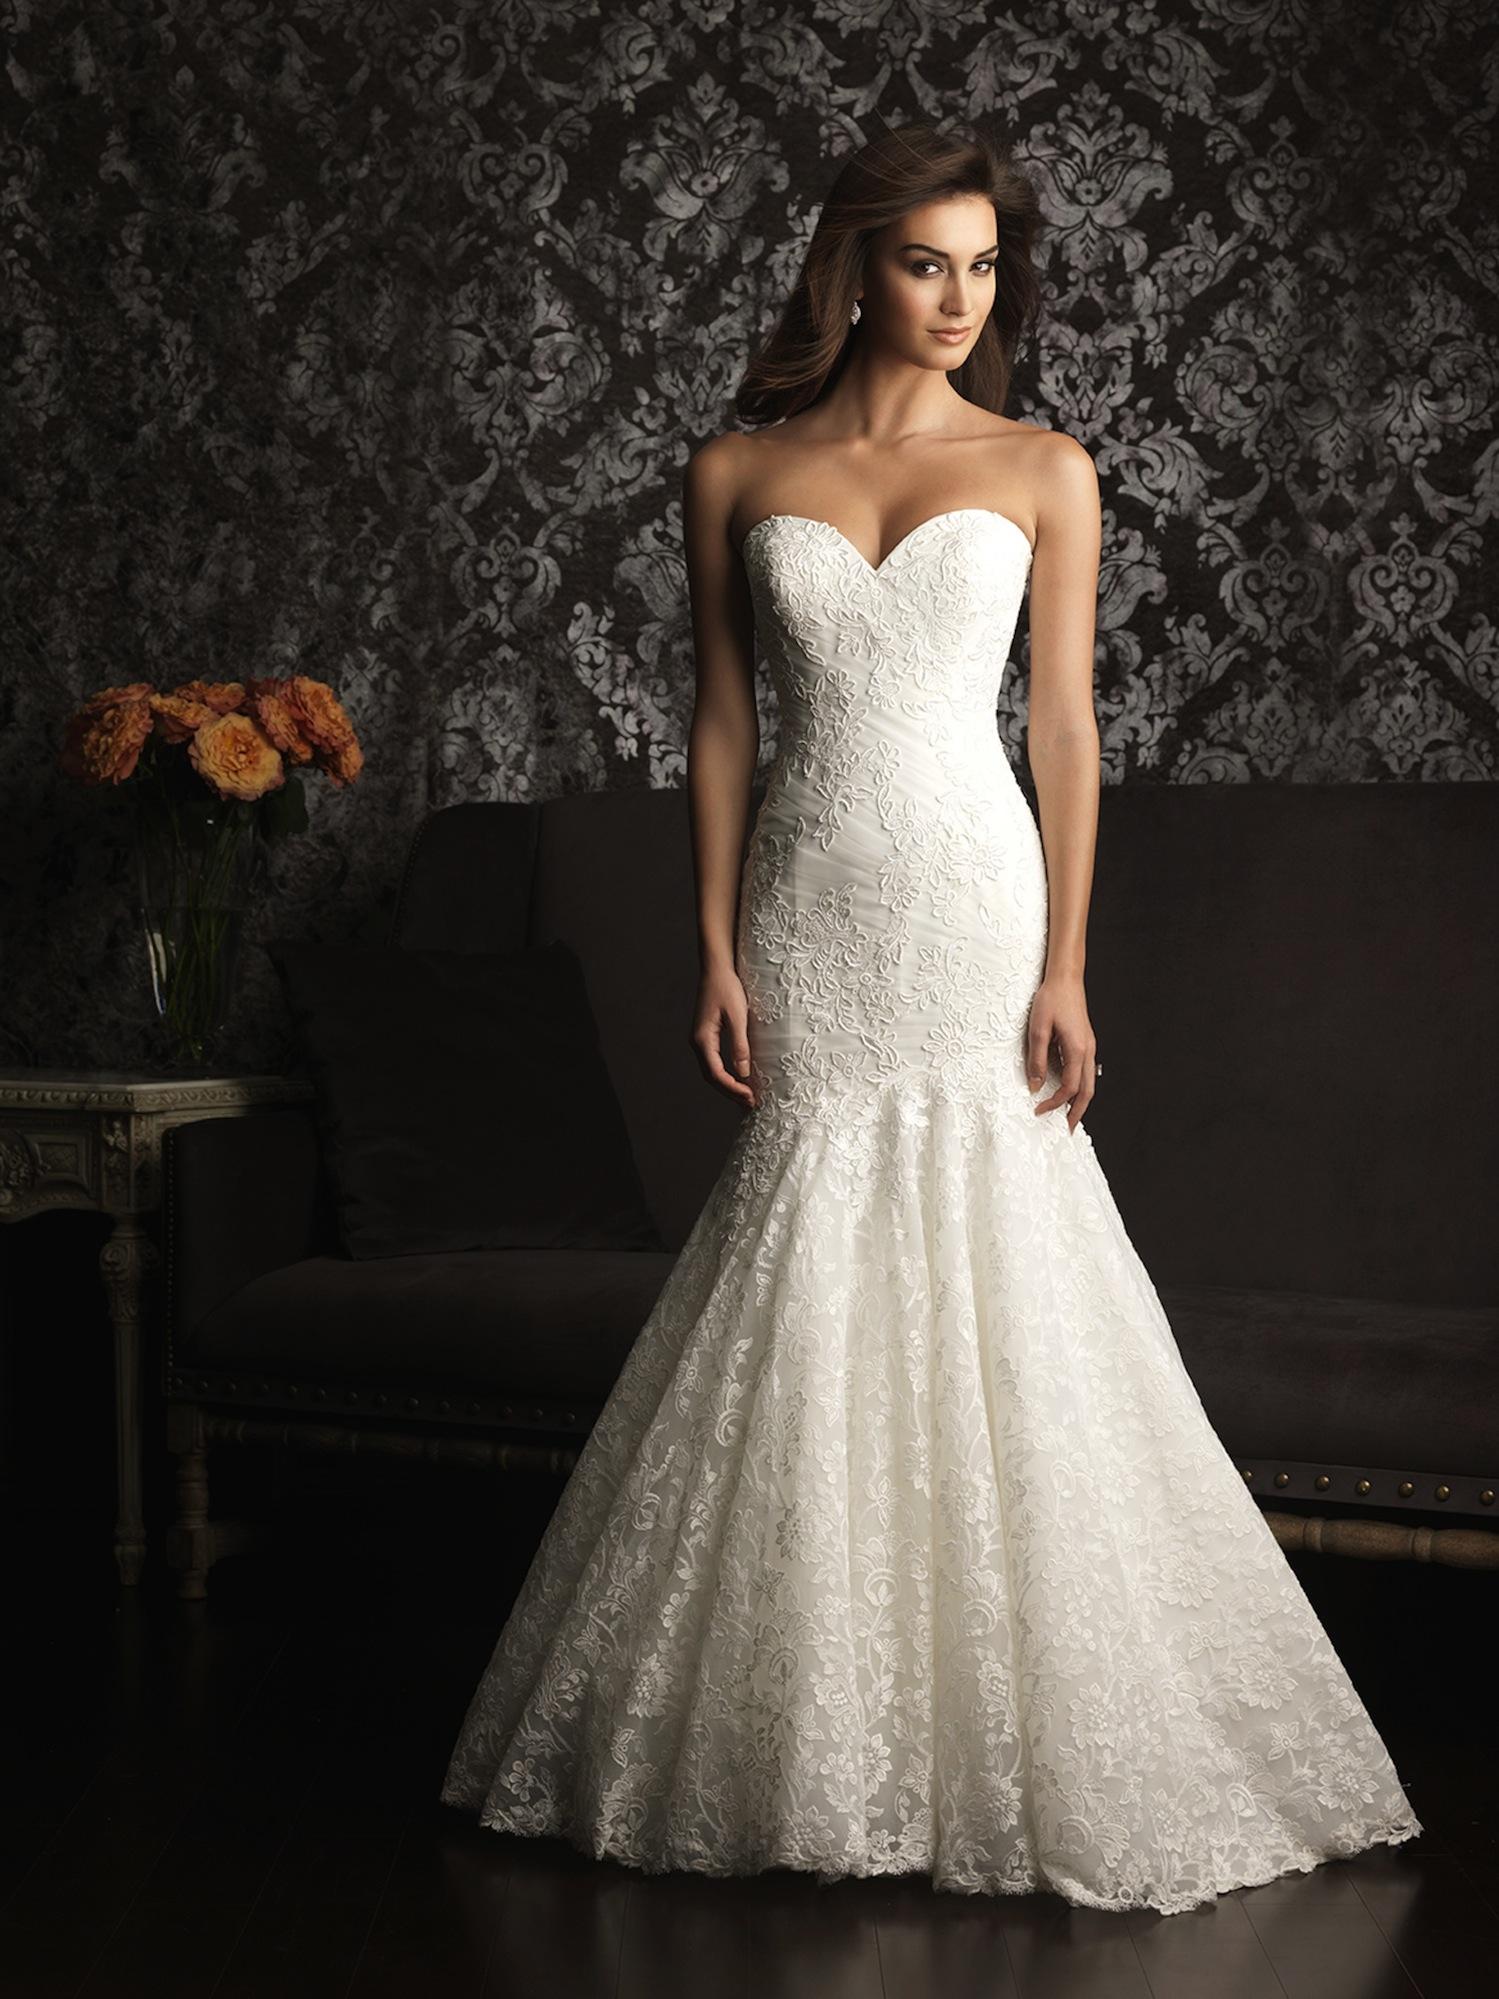 Allure Wedding Gowns 026 - Allure Wedding Gowns